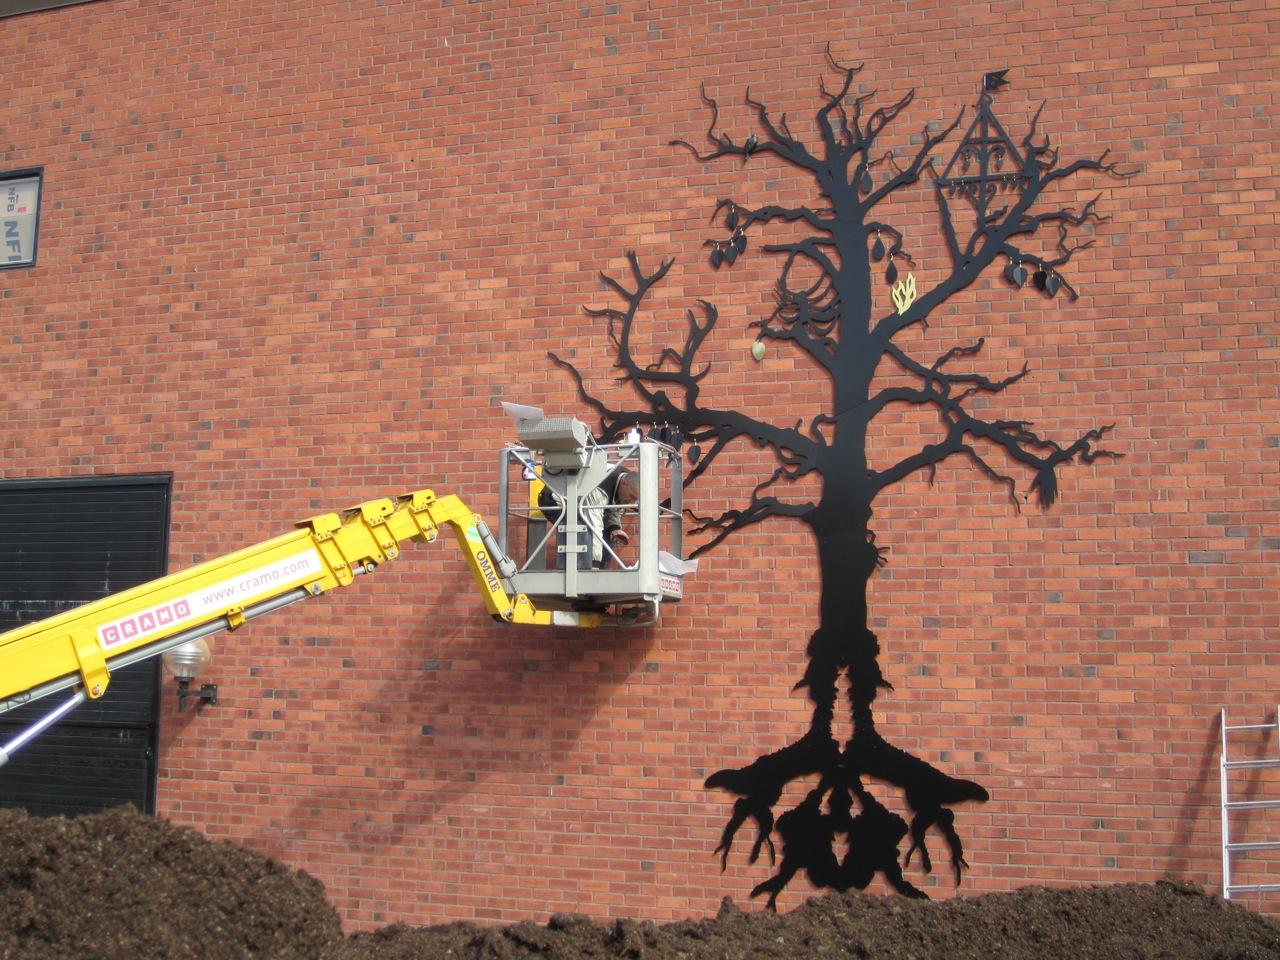 The Other Tree - Tilda lovell